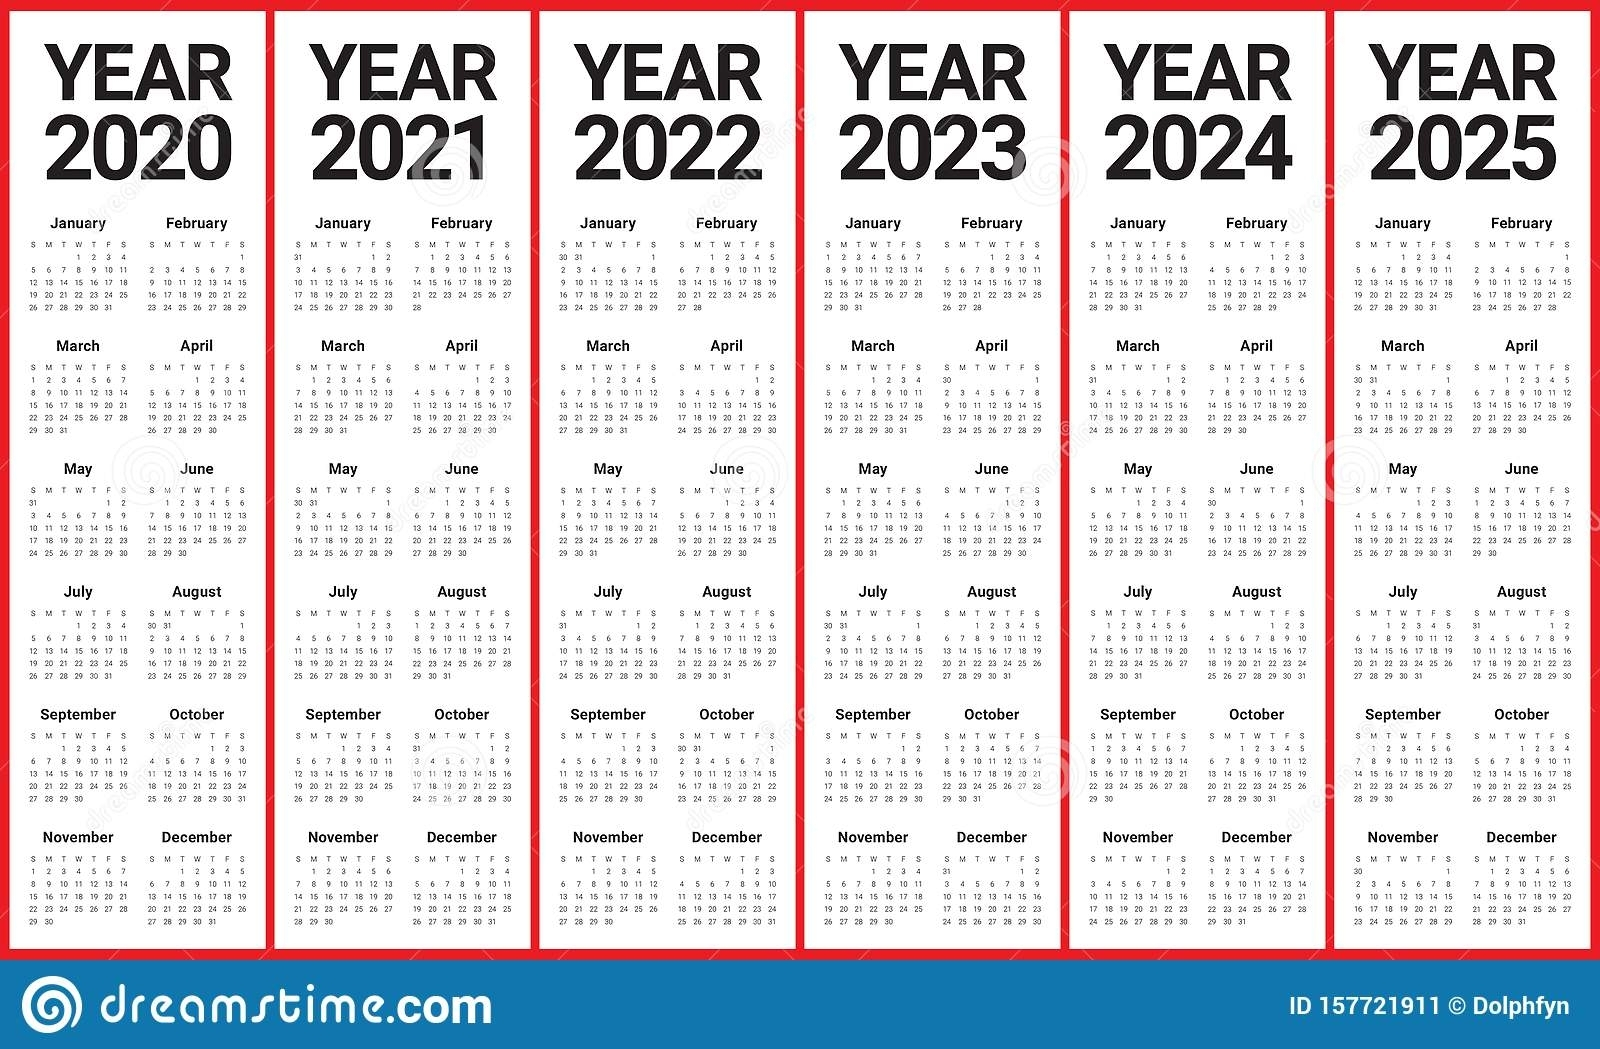 3 Year Calendar 2020 To 2023 | Calendar Template Printable